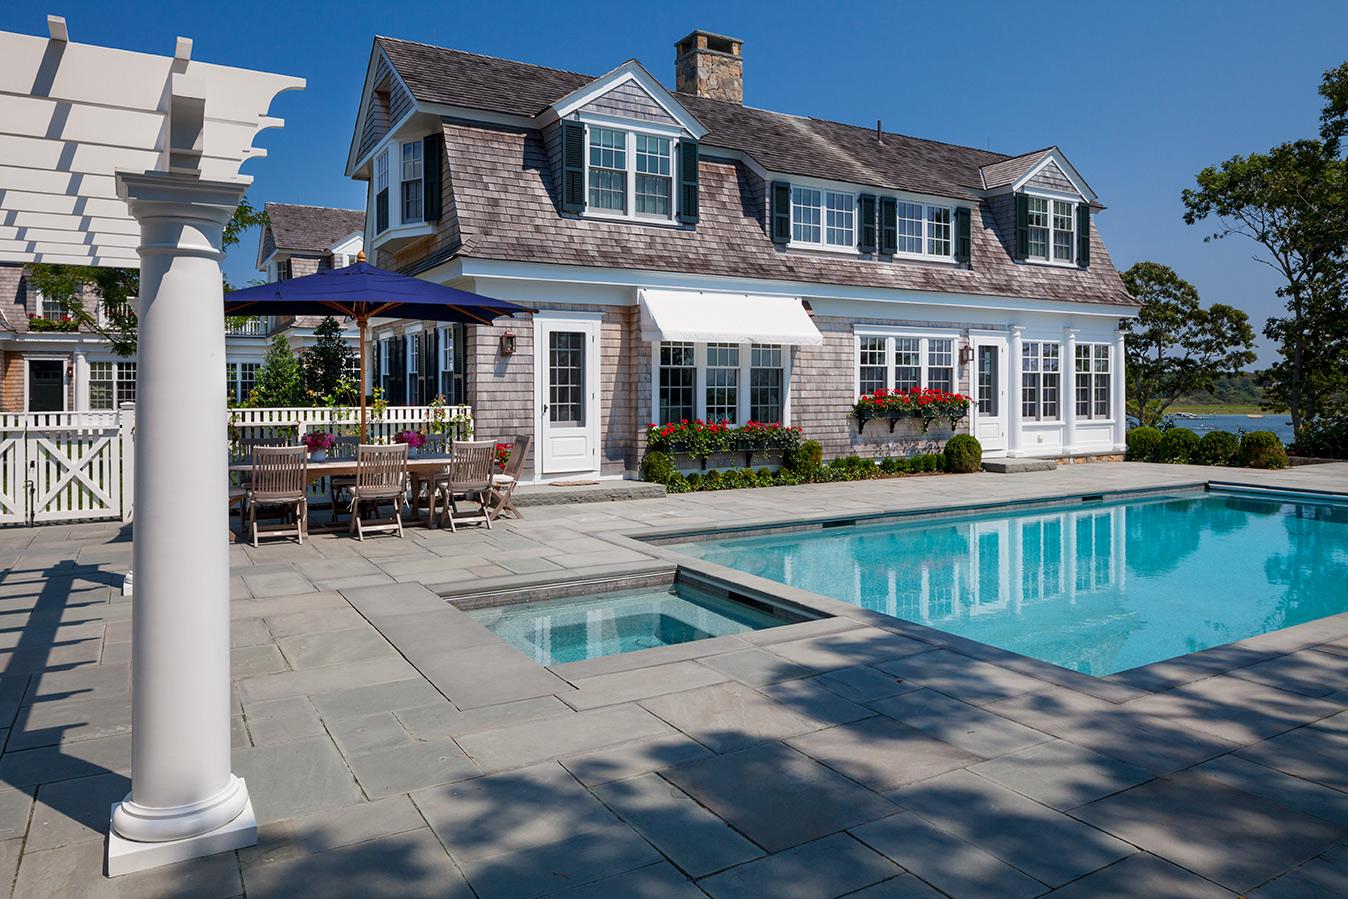 "Residential (New Construction) over 5,000 SF ""Coastal New England Harbor House"" Patrick Ahearn Architect"